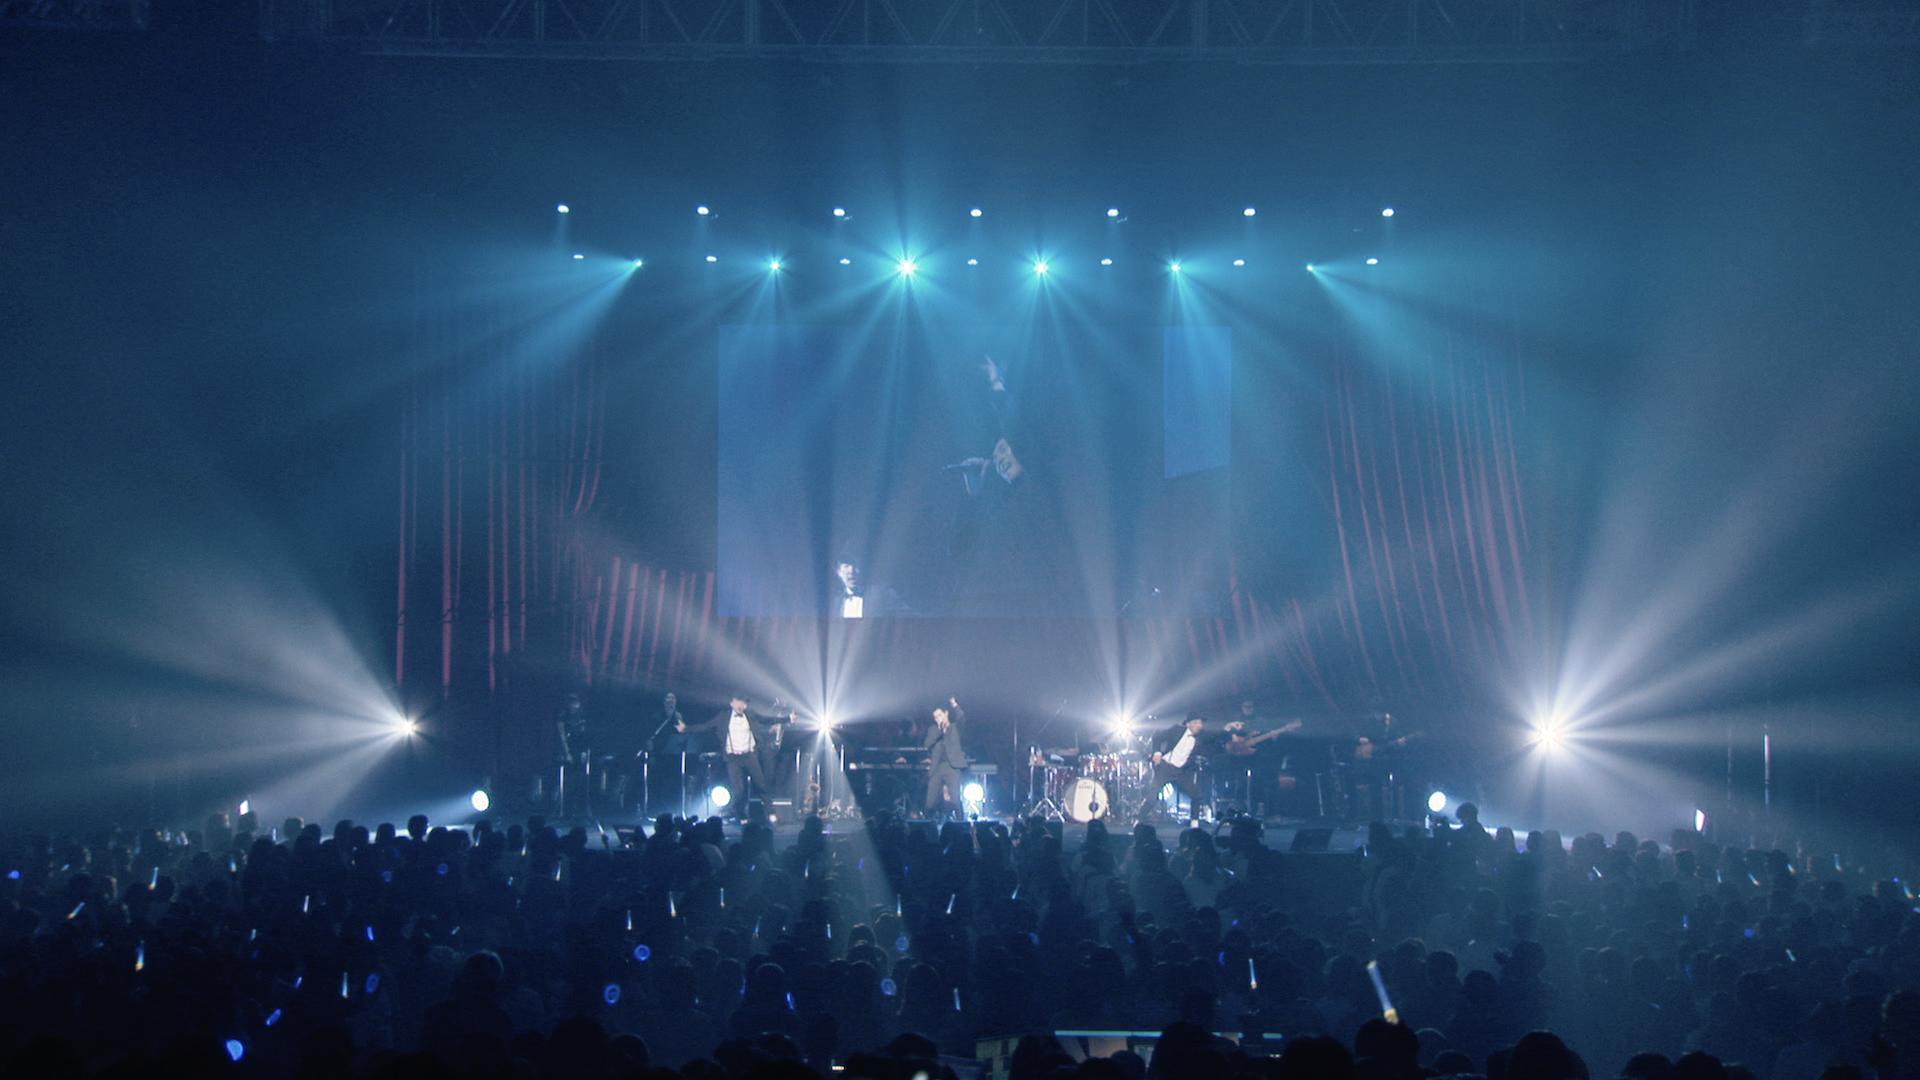 LEE JONG HYUN-LEE JONG HYUN Solo Concert in Japan ーMETROPOLISー